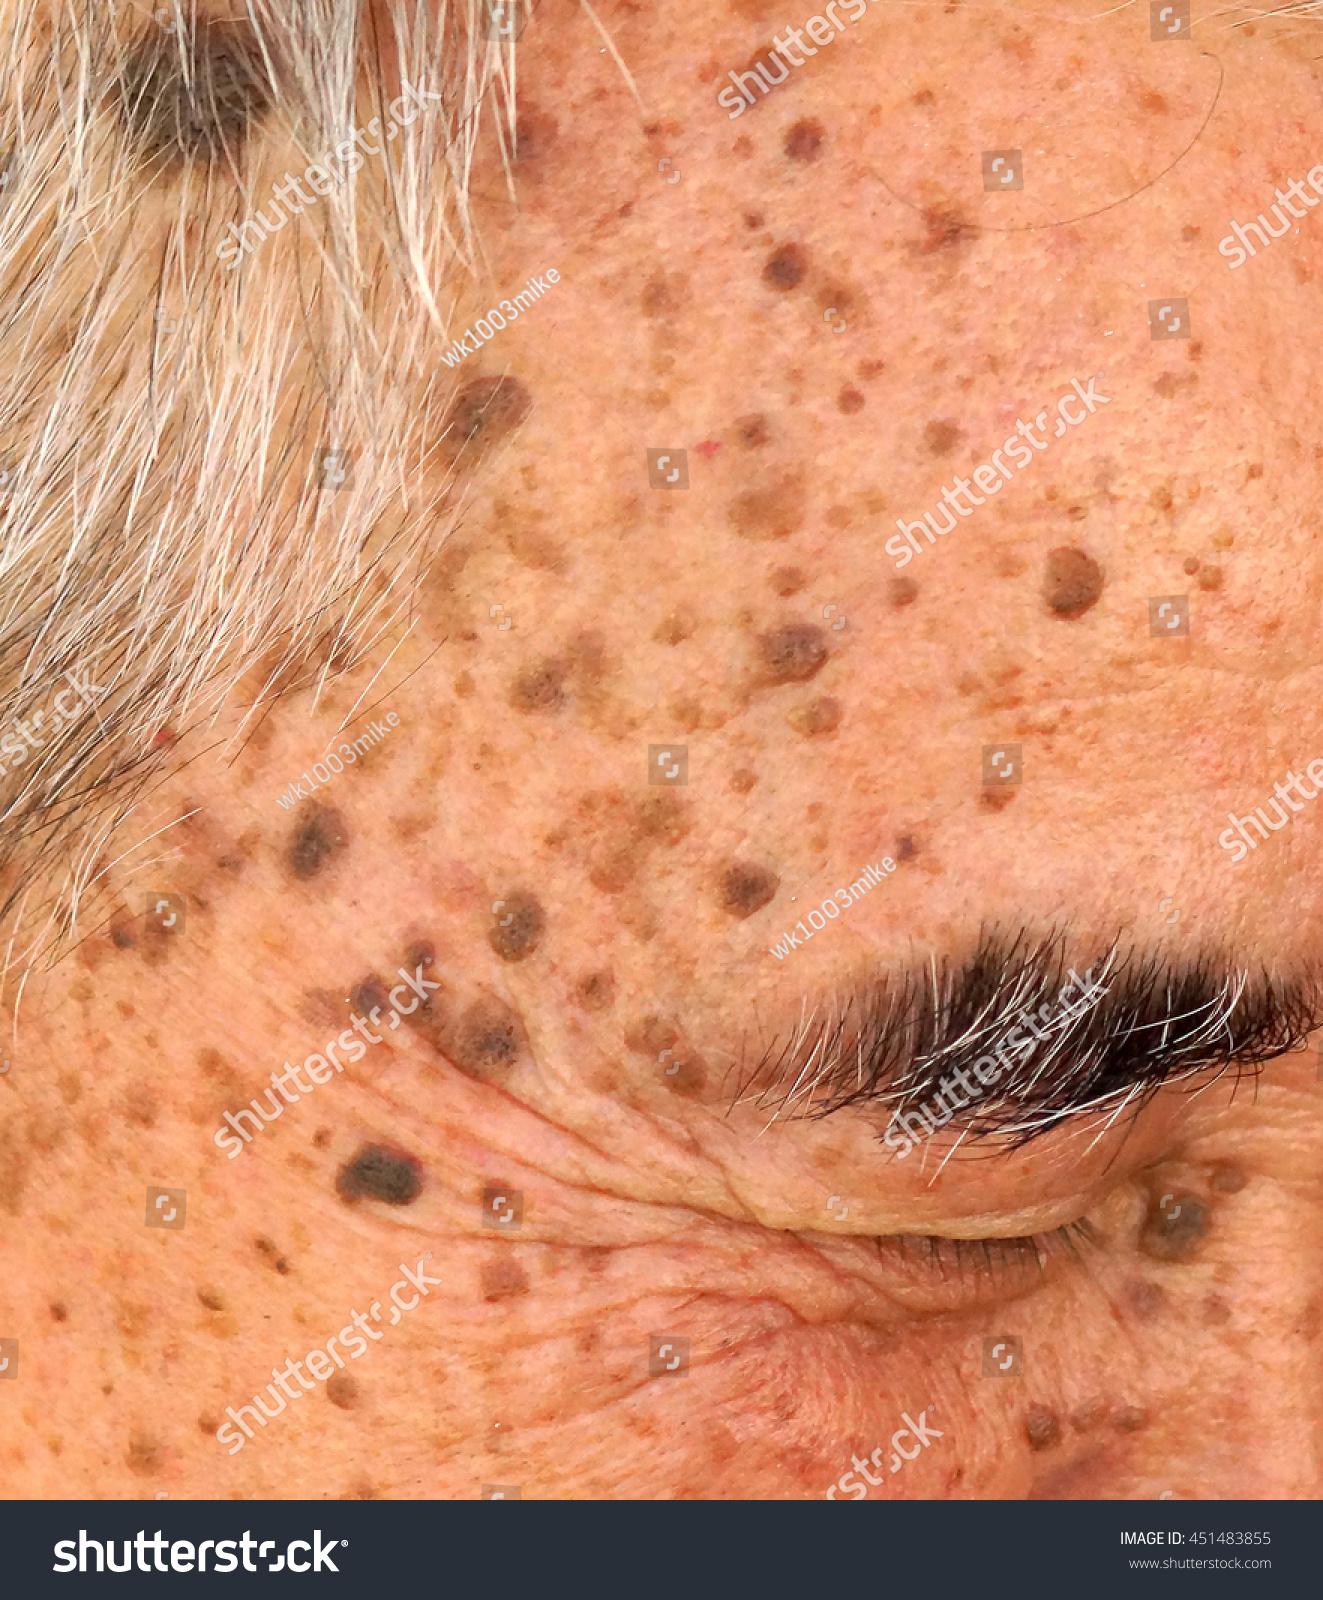 warts on old skin)